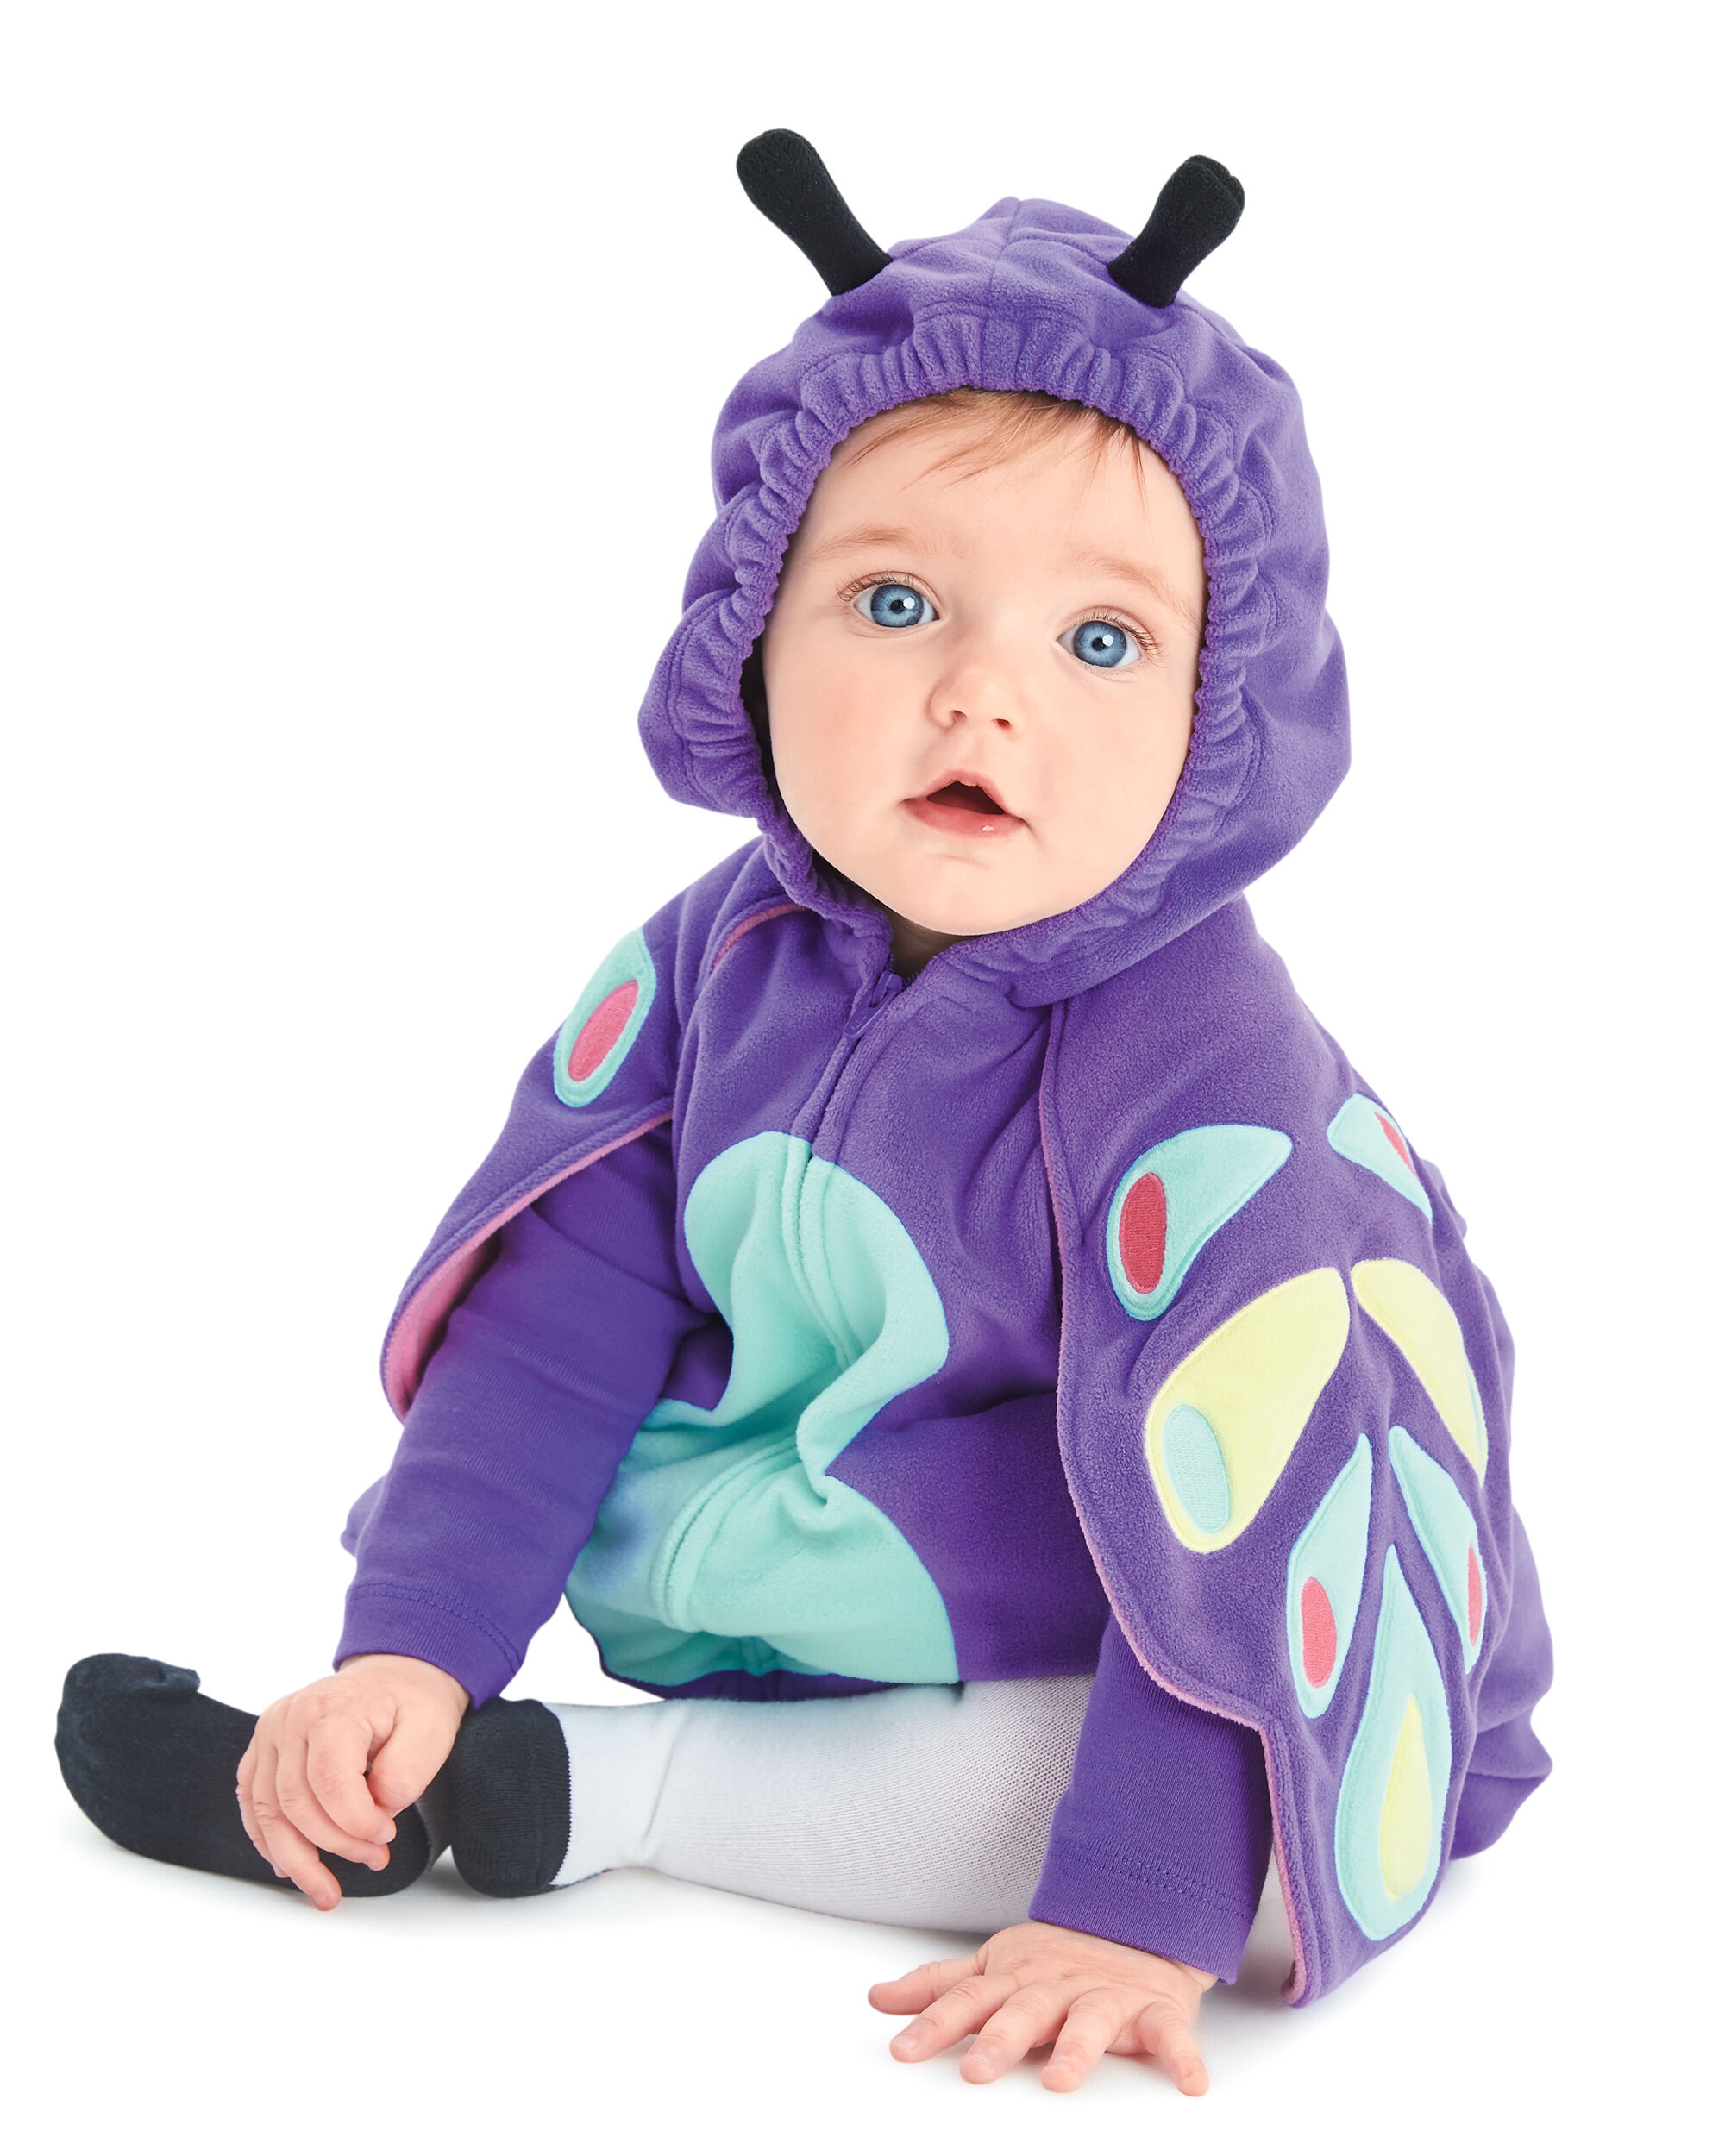 Little Butterfly Halloween Costume ...  sc 1 st  Carteru0027s & Little Butterfly Halloween Costume | Carters.com